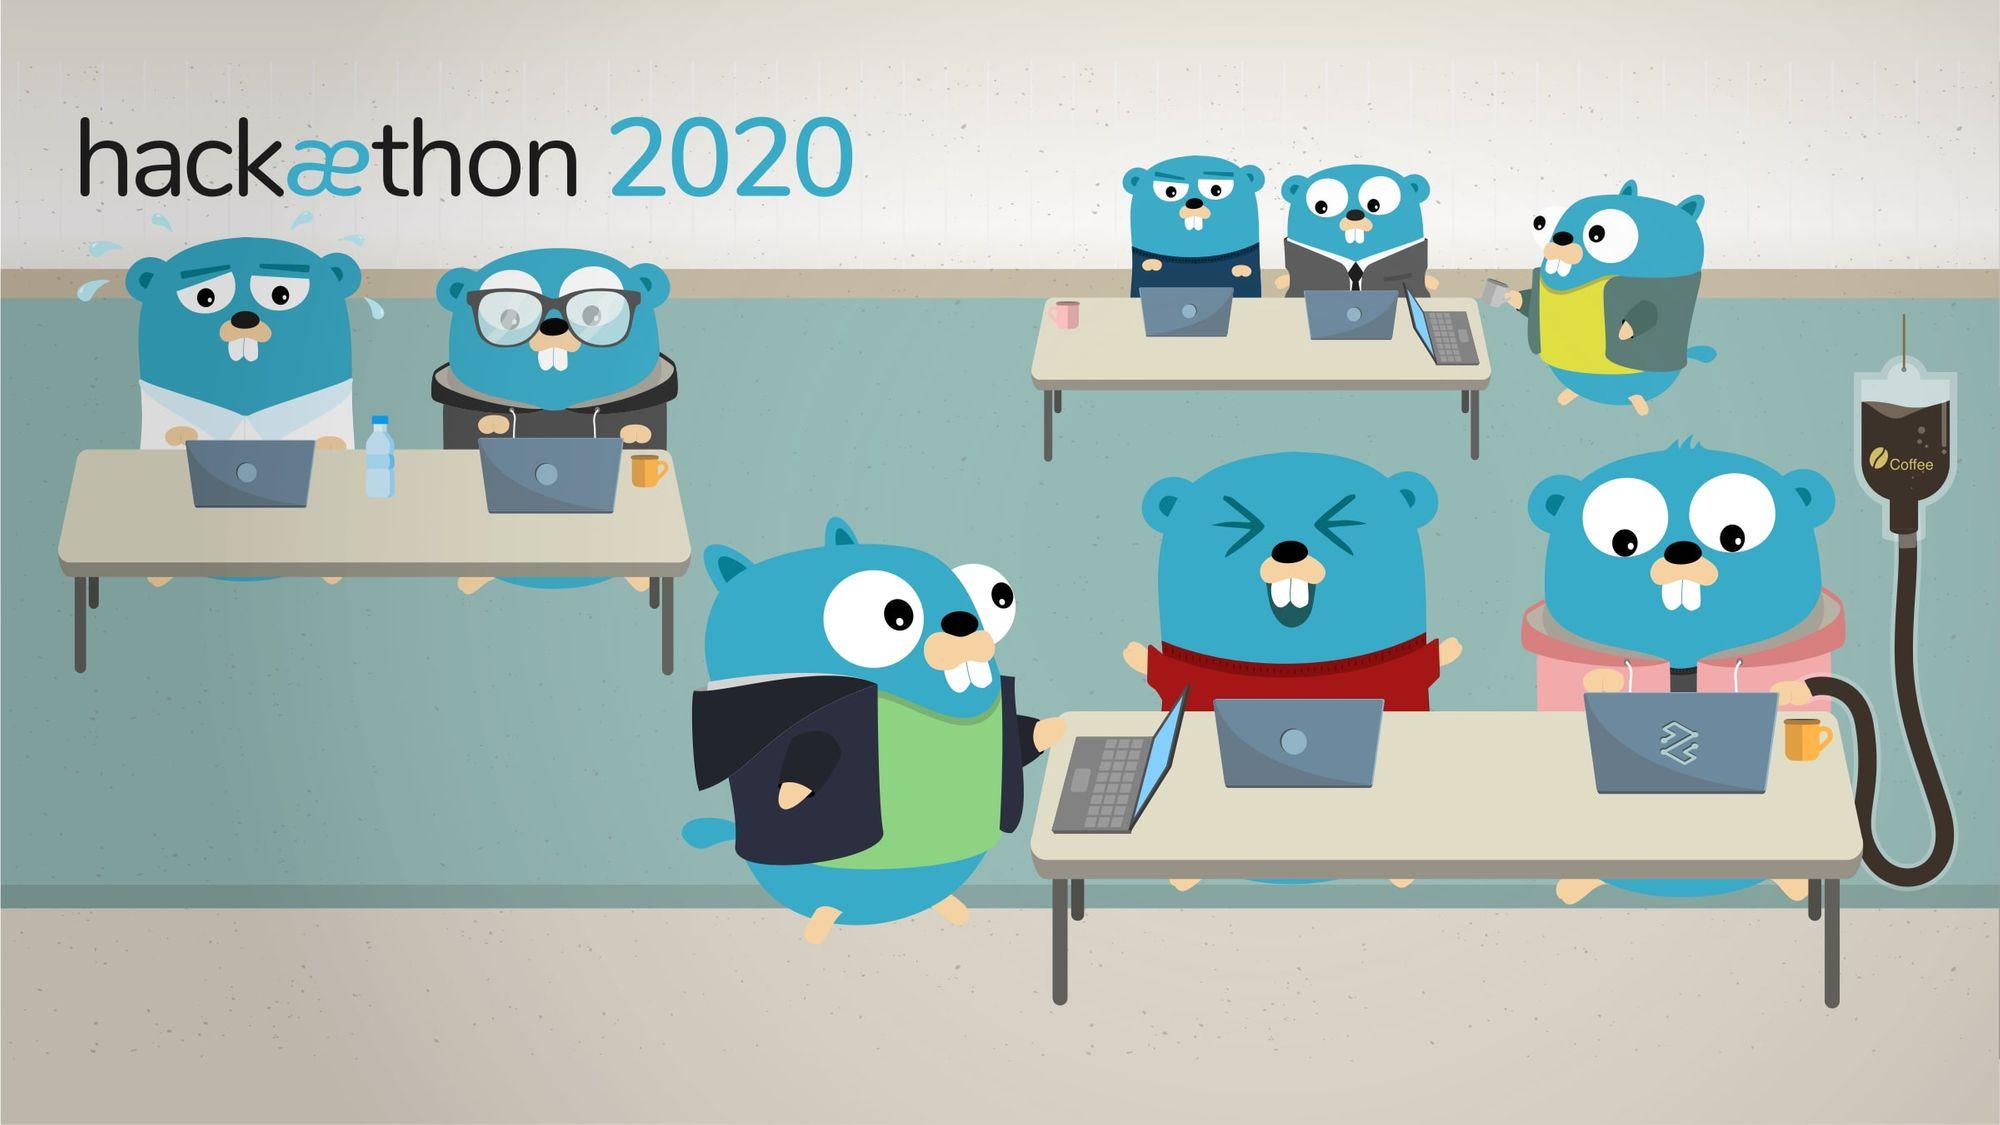 Announcing the Inaugural Traefik Hackaethon 2020